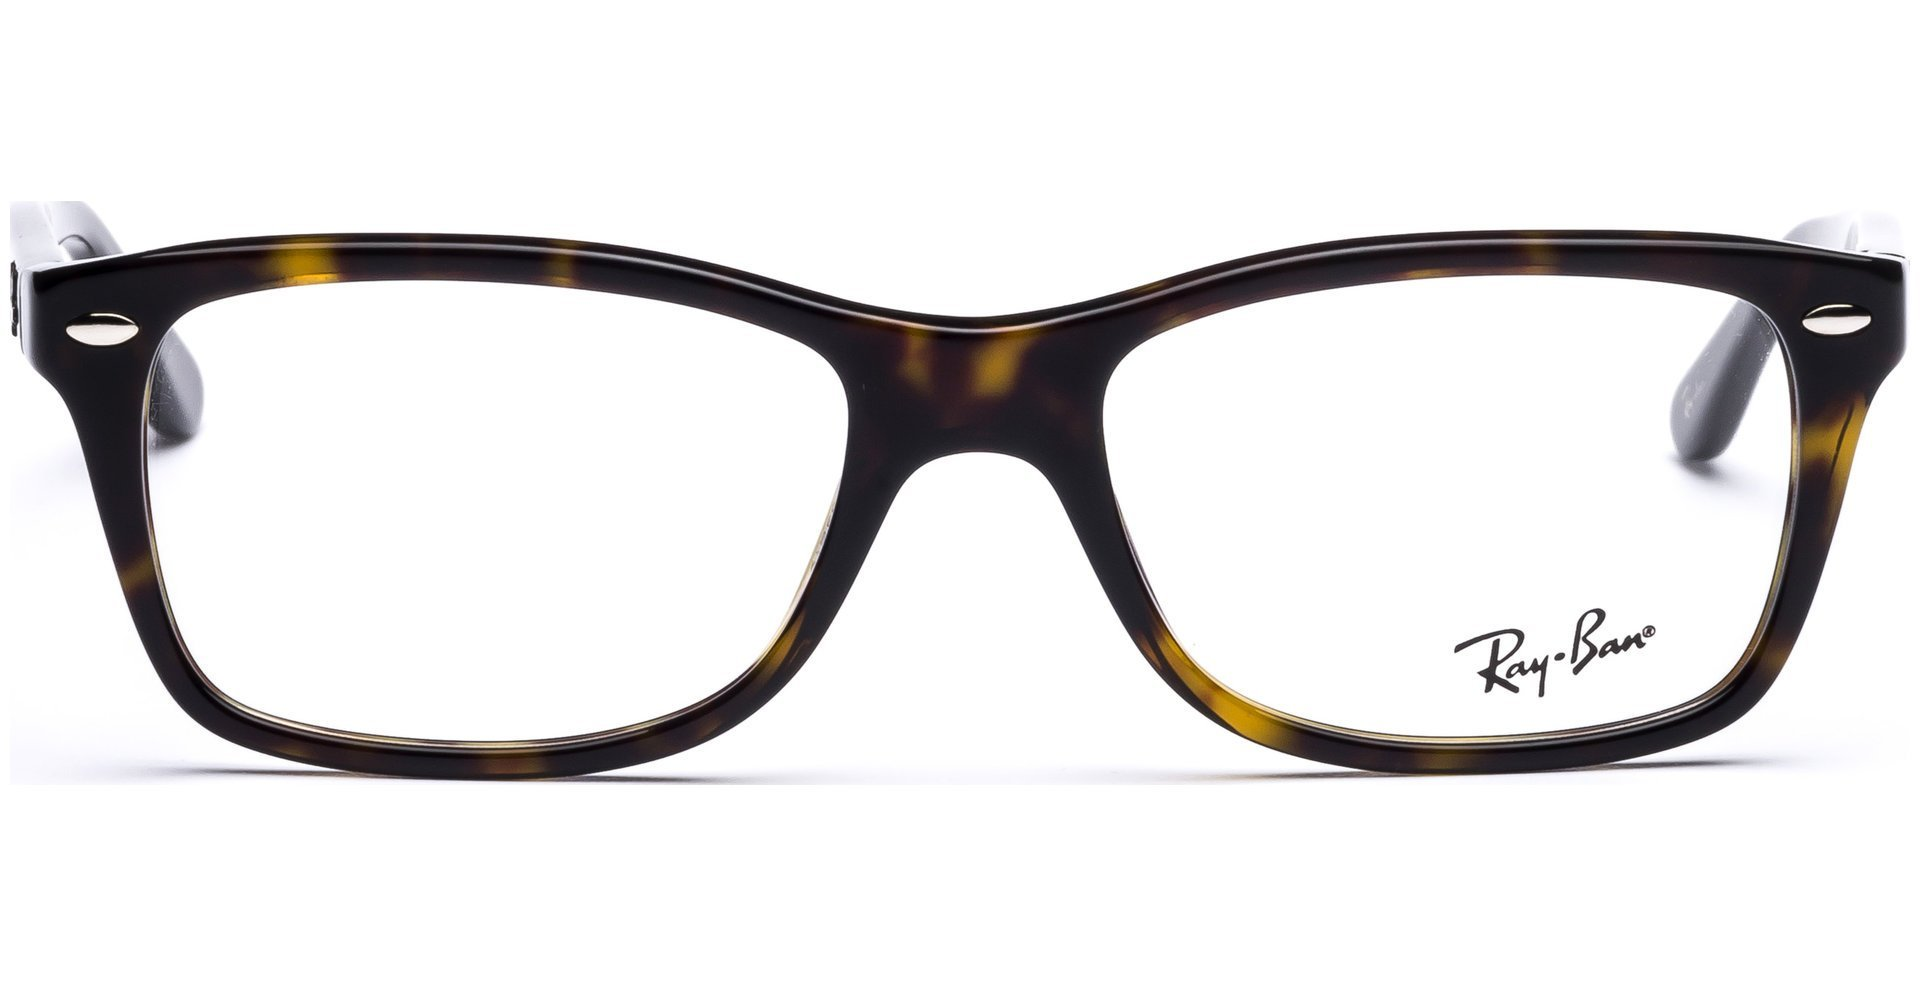 Ray-Ban Women's RX5228 Eyeglasses Dark Havana 55mm by Ray-Ban